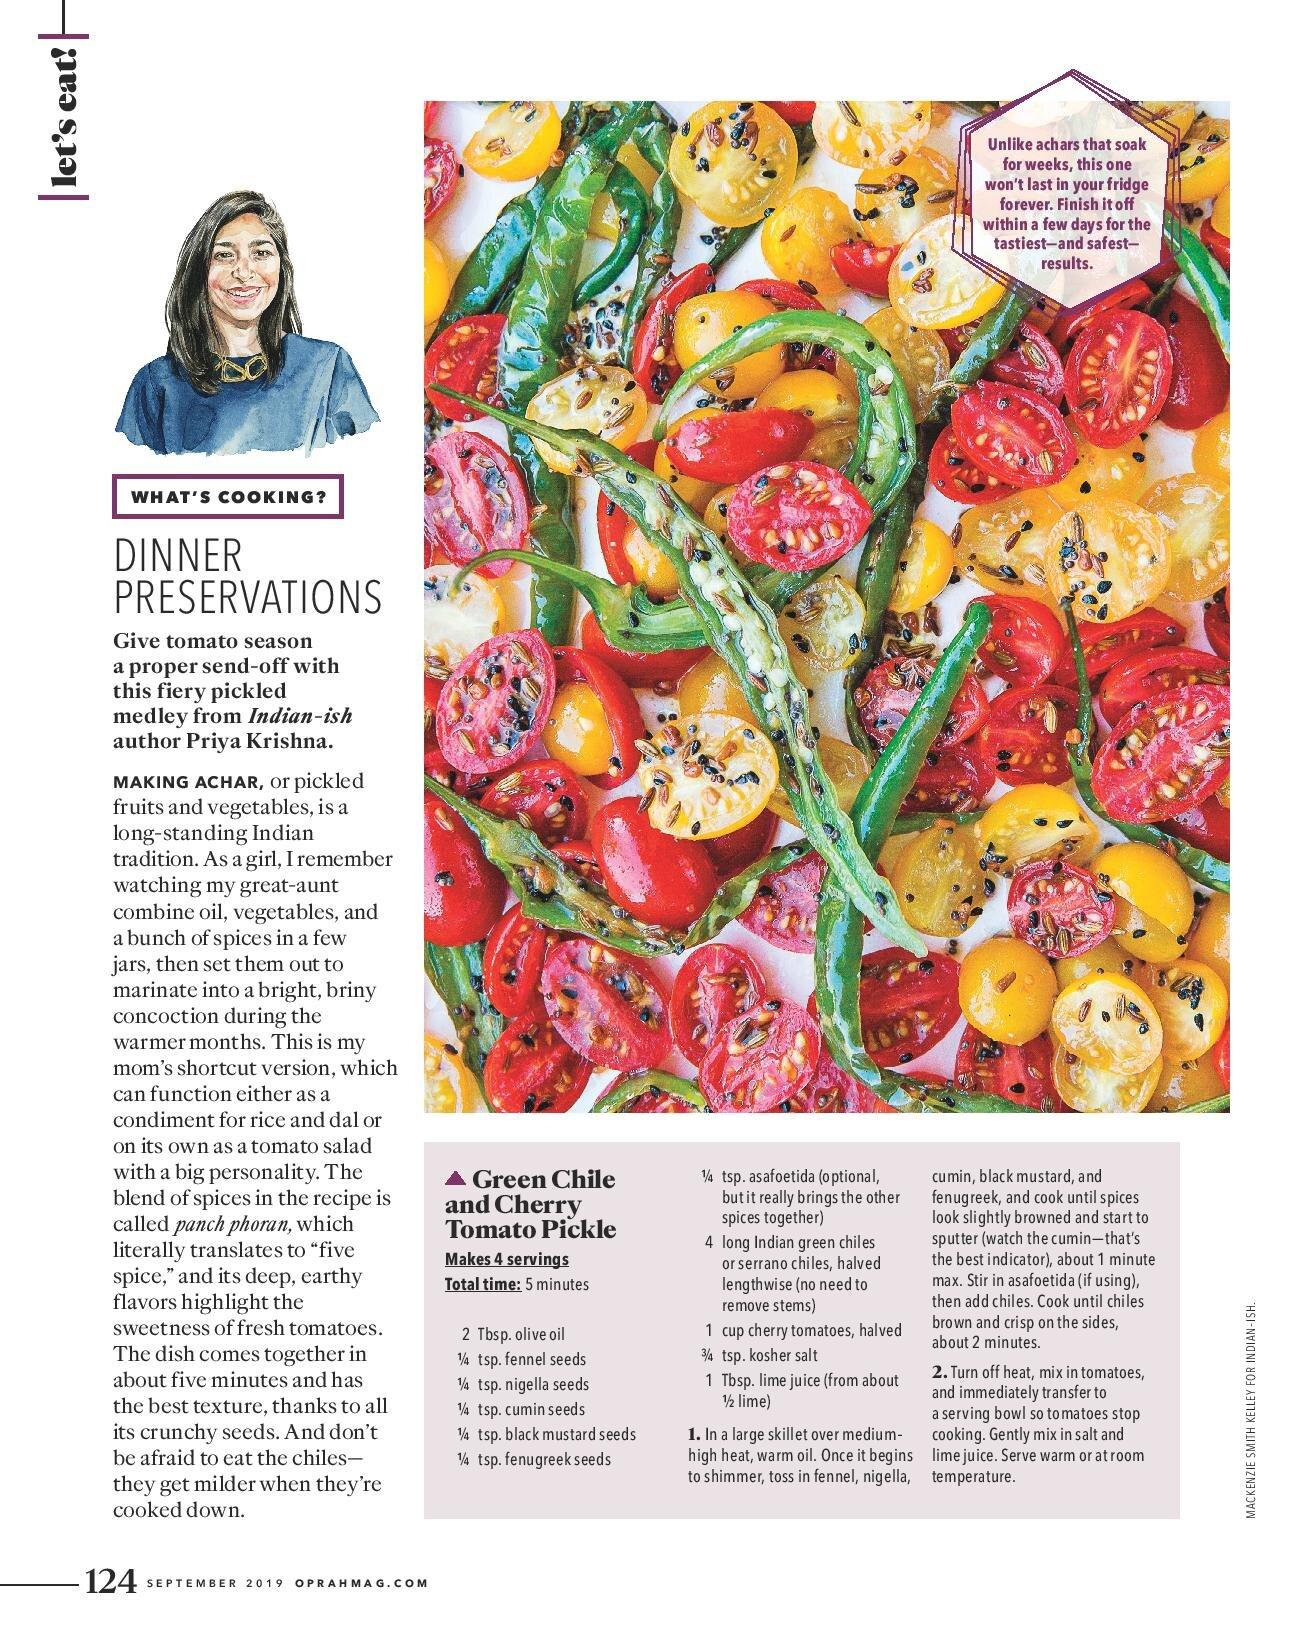 Oprah Magazine What s Cooking from OPR090119LetsEat_lo_author priya krishna_food stylist judy kim_photo mackenzie smith kelley_sept 2019.jpg